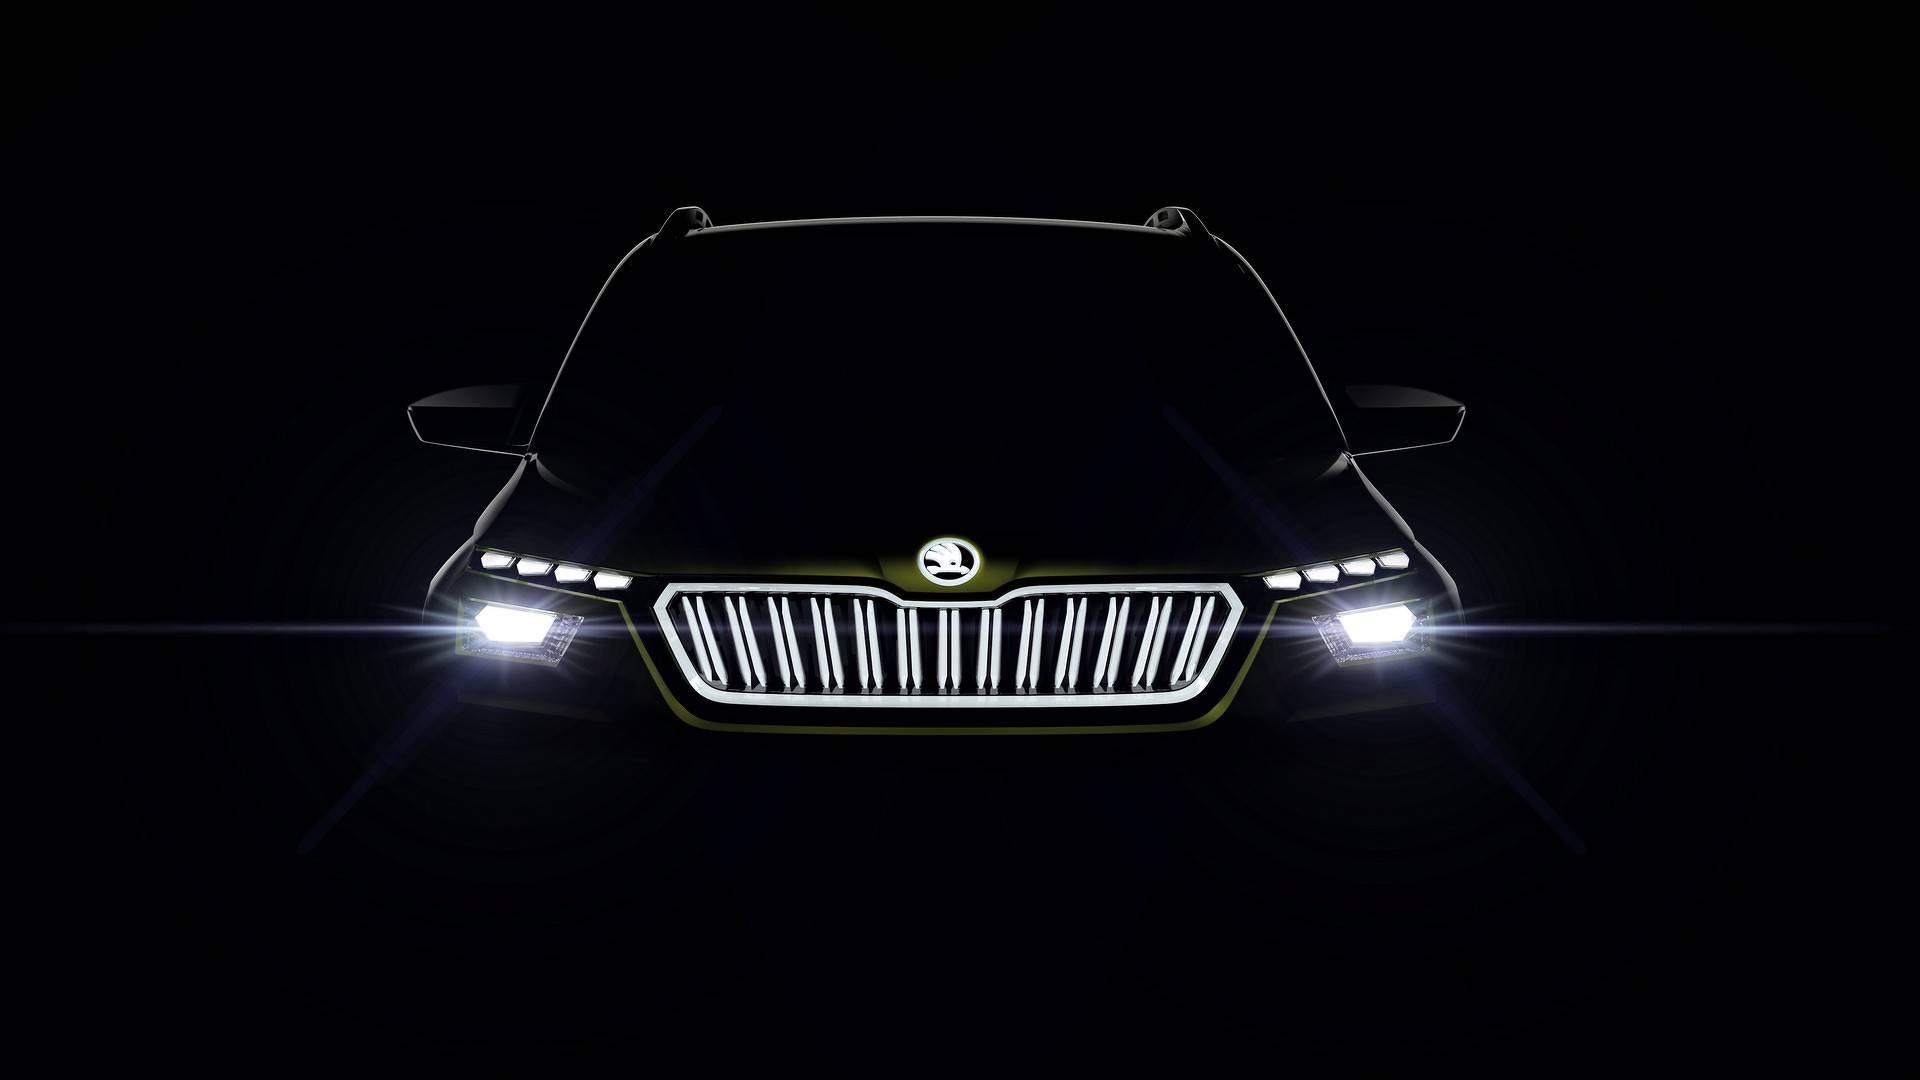 skoda vision x concept teaser اسکودا ایکس یک خودرو کاملا منحصر و زیبا   اجاره ماشین